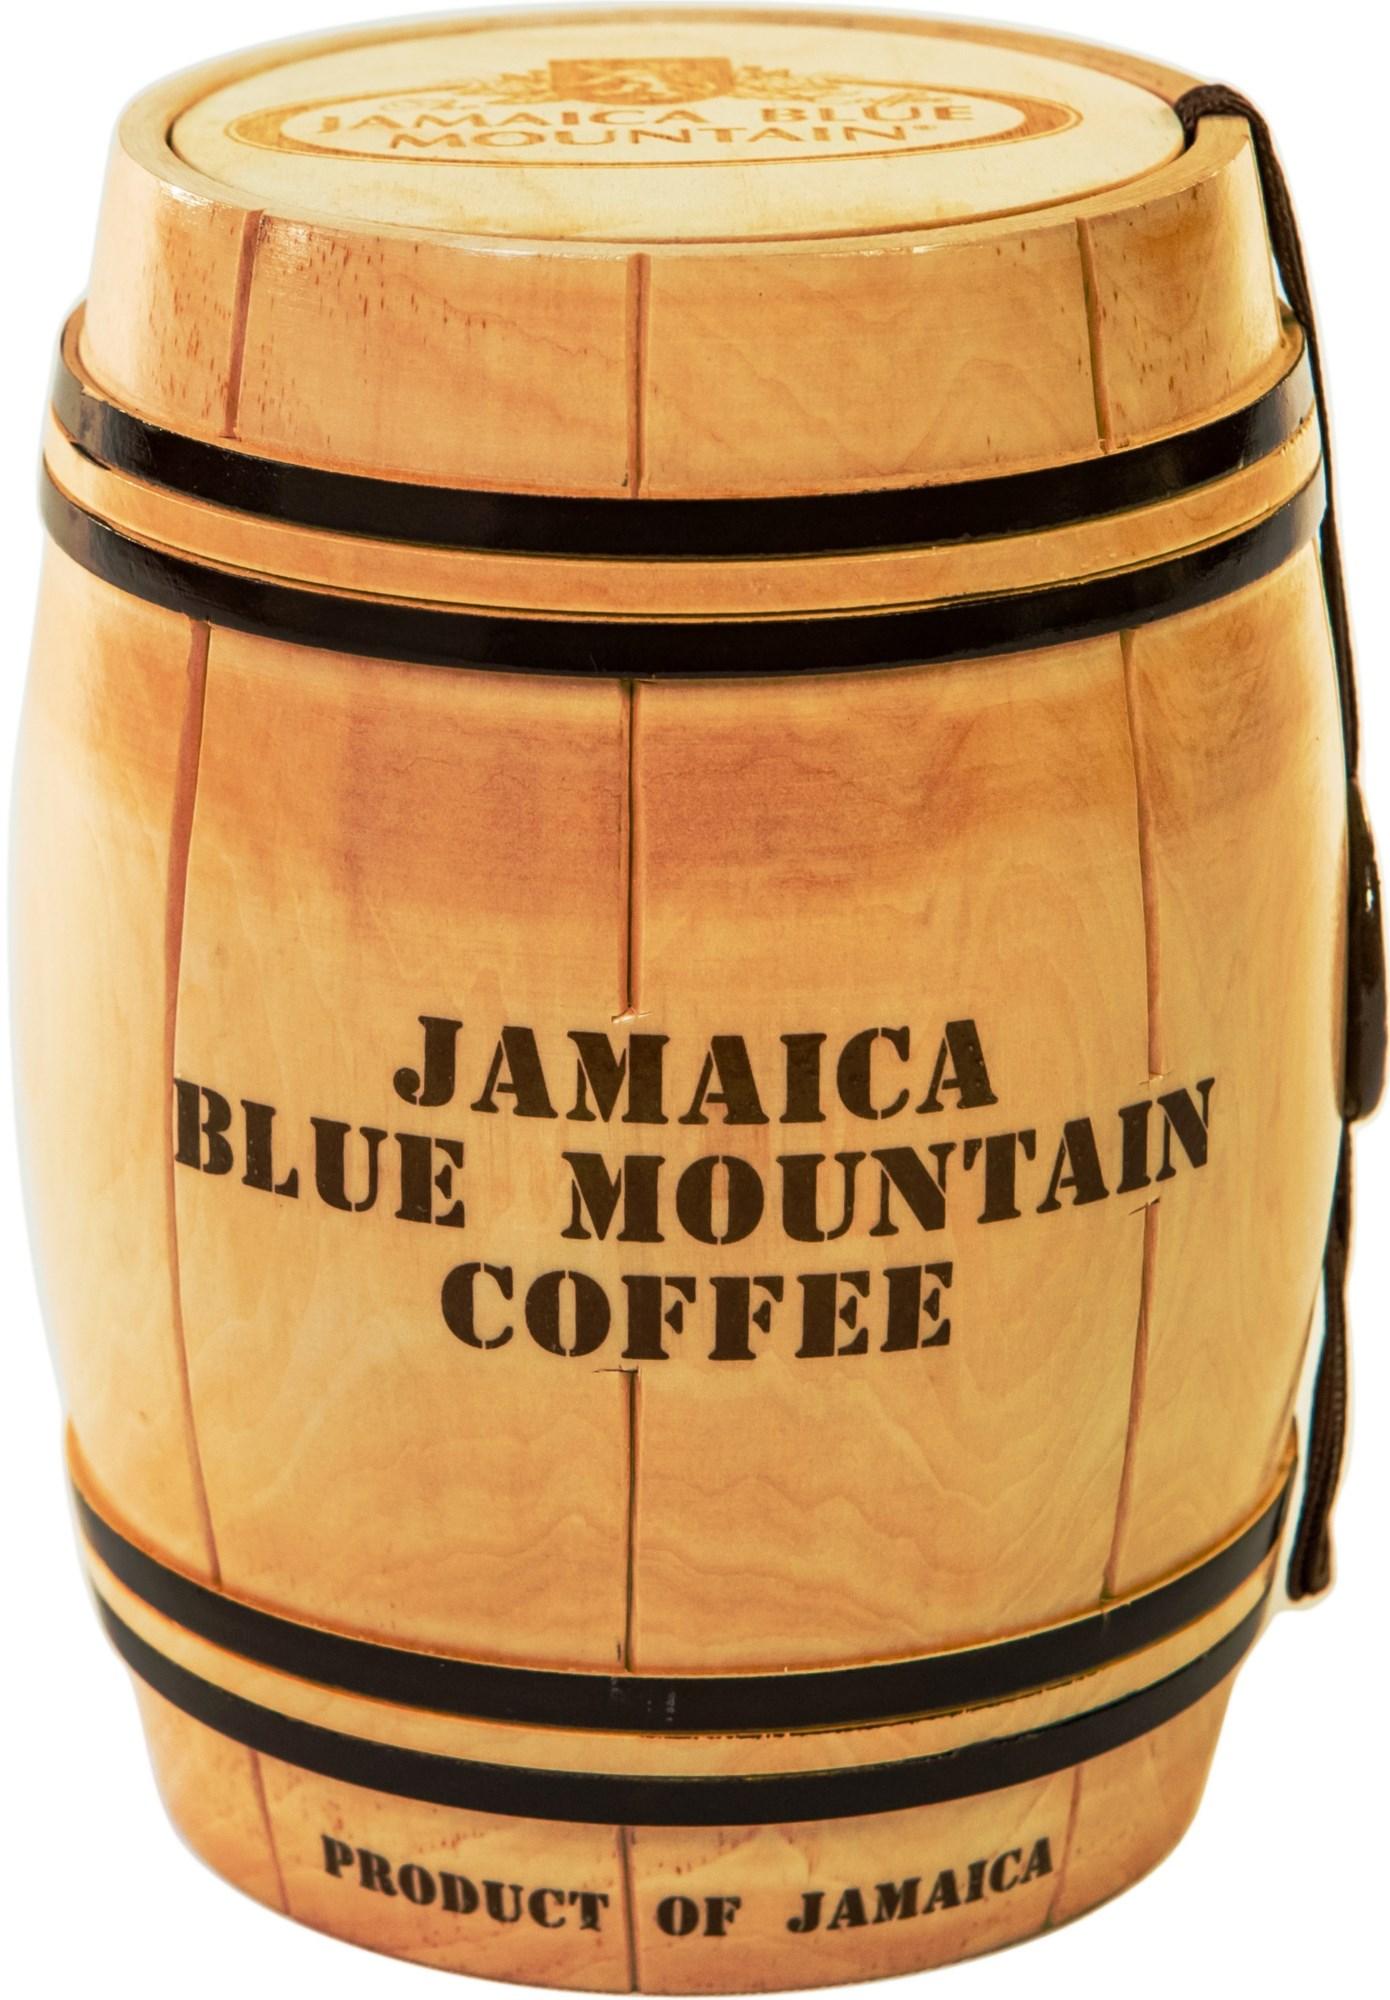 Кофе Ямайка Блю Маунтин, зерно, обжарка средняя, бочонок (200 г)